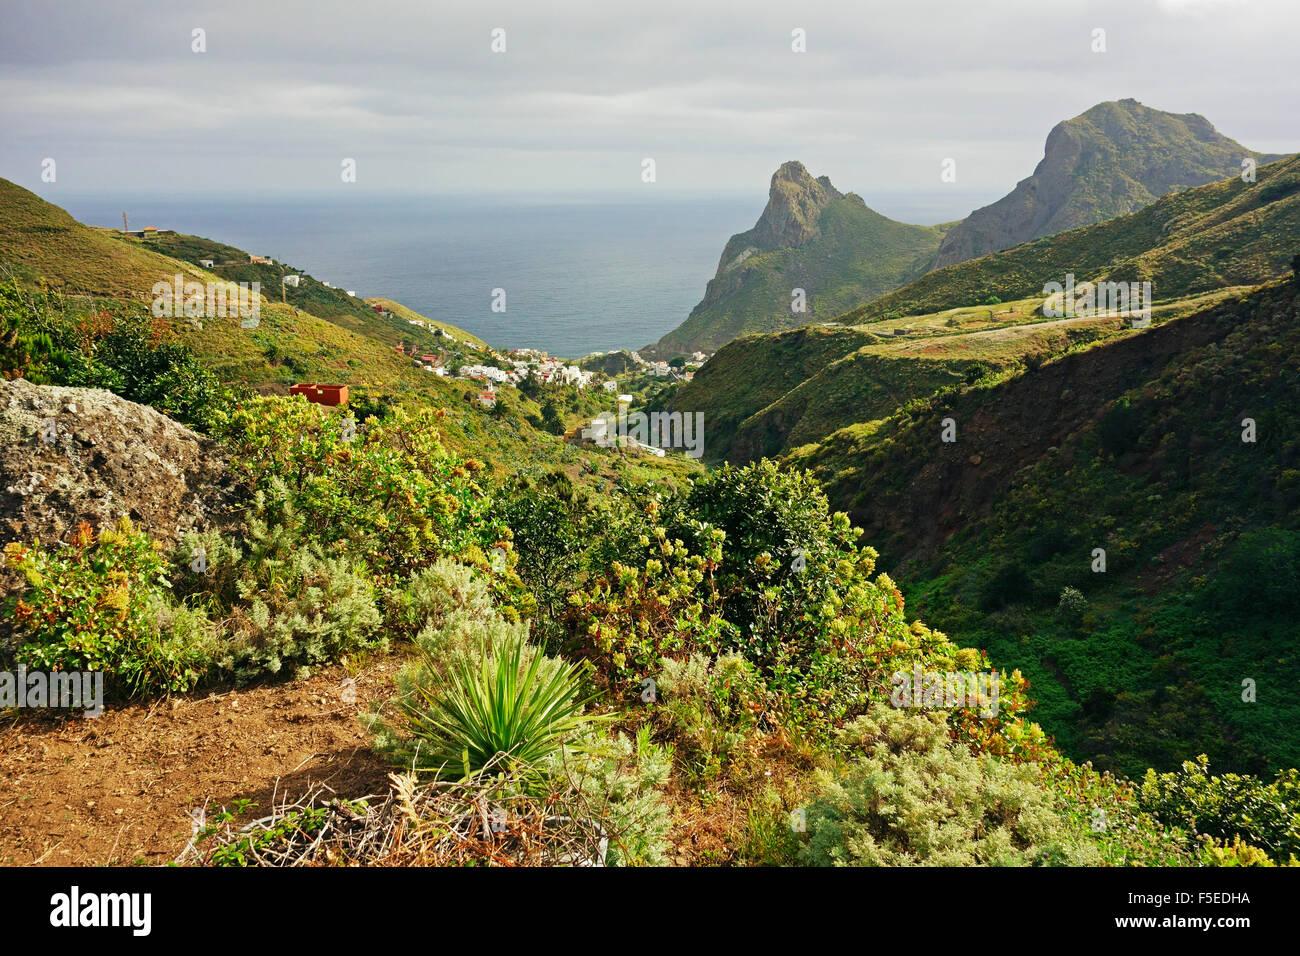 Taganana Dorf, Anaga-Gebirge, Teneriffa, Kanarische Inseln, Spanien, Atlantik, Europa Stockfoto